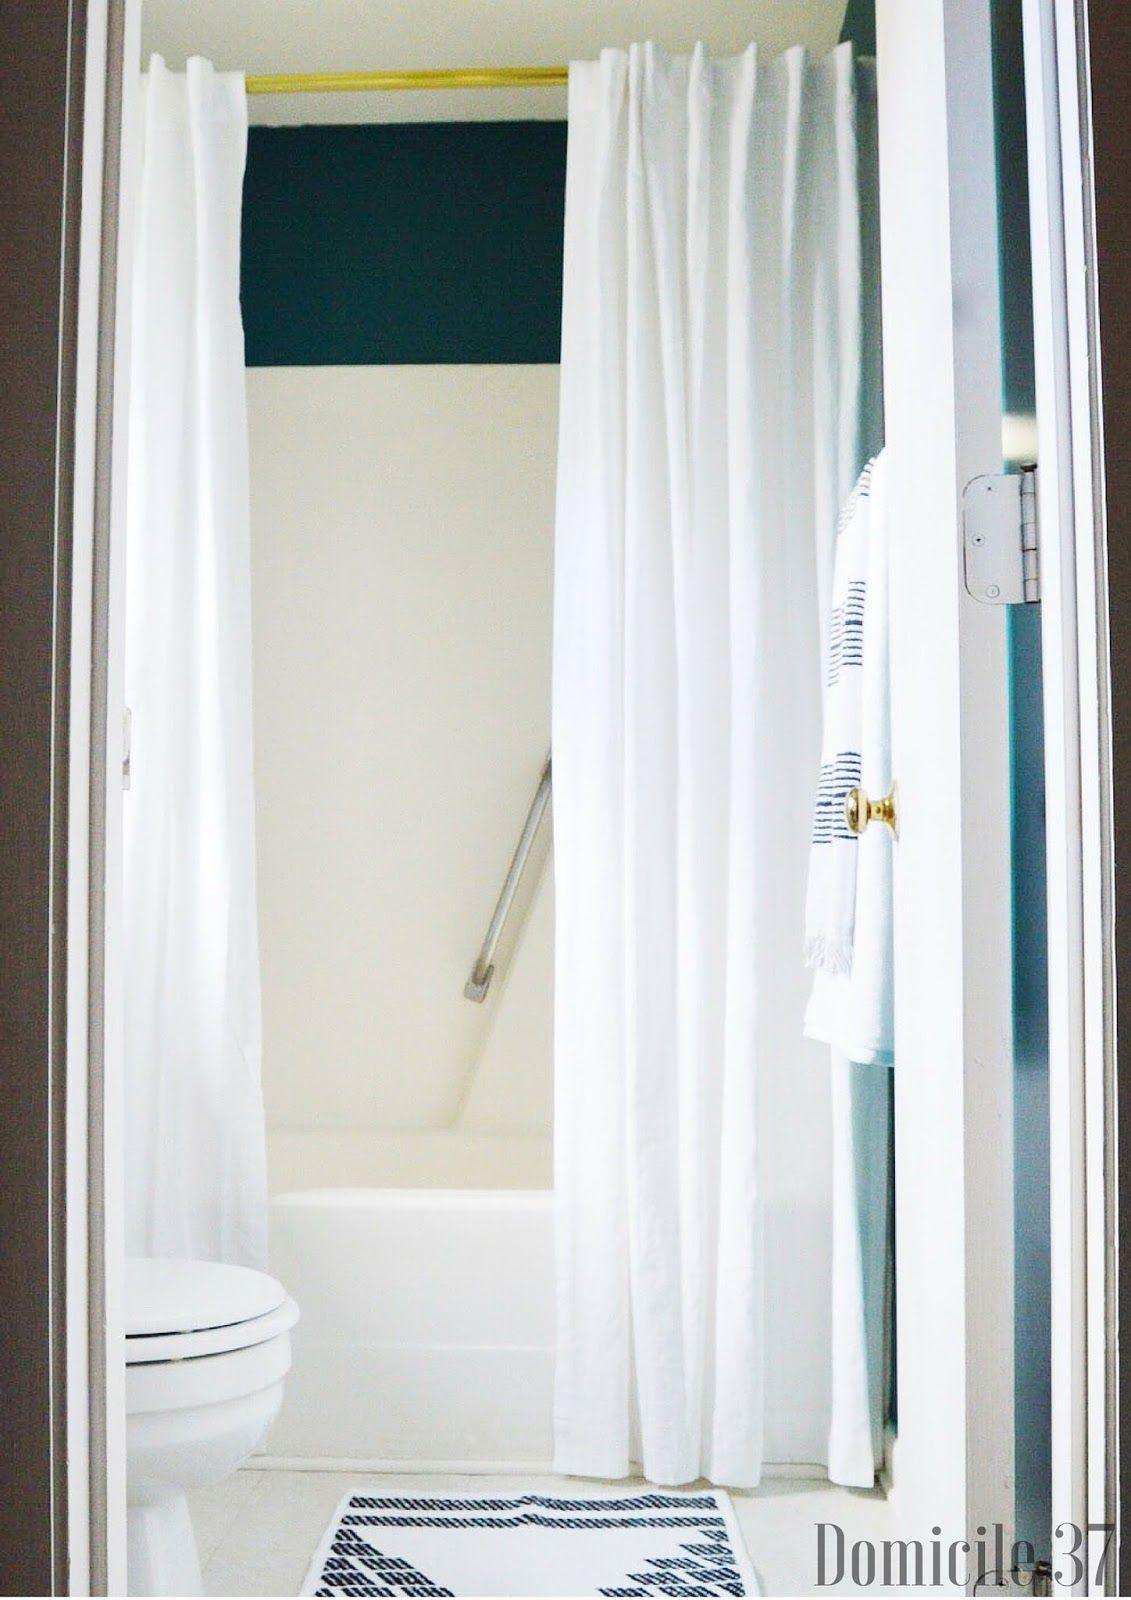 Domicile 37 Vintage Moody Bathroom Refresh With Ace Hardware 31DaysofColor Sponsored Ad